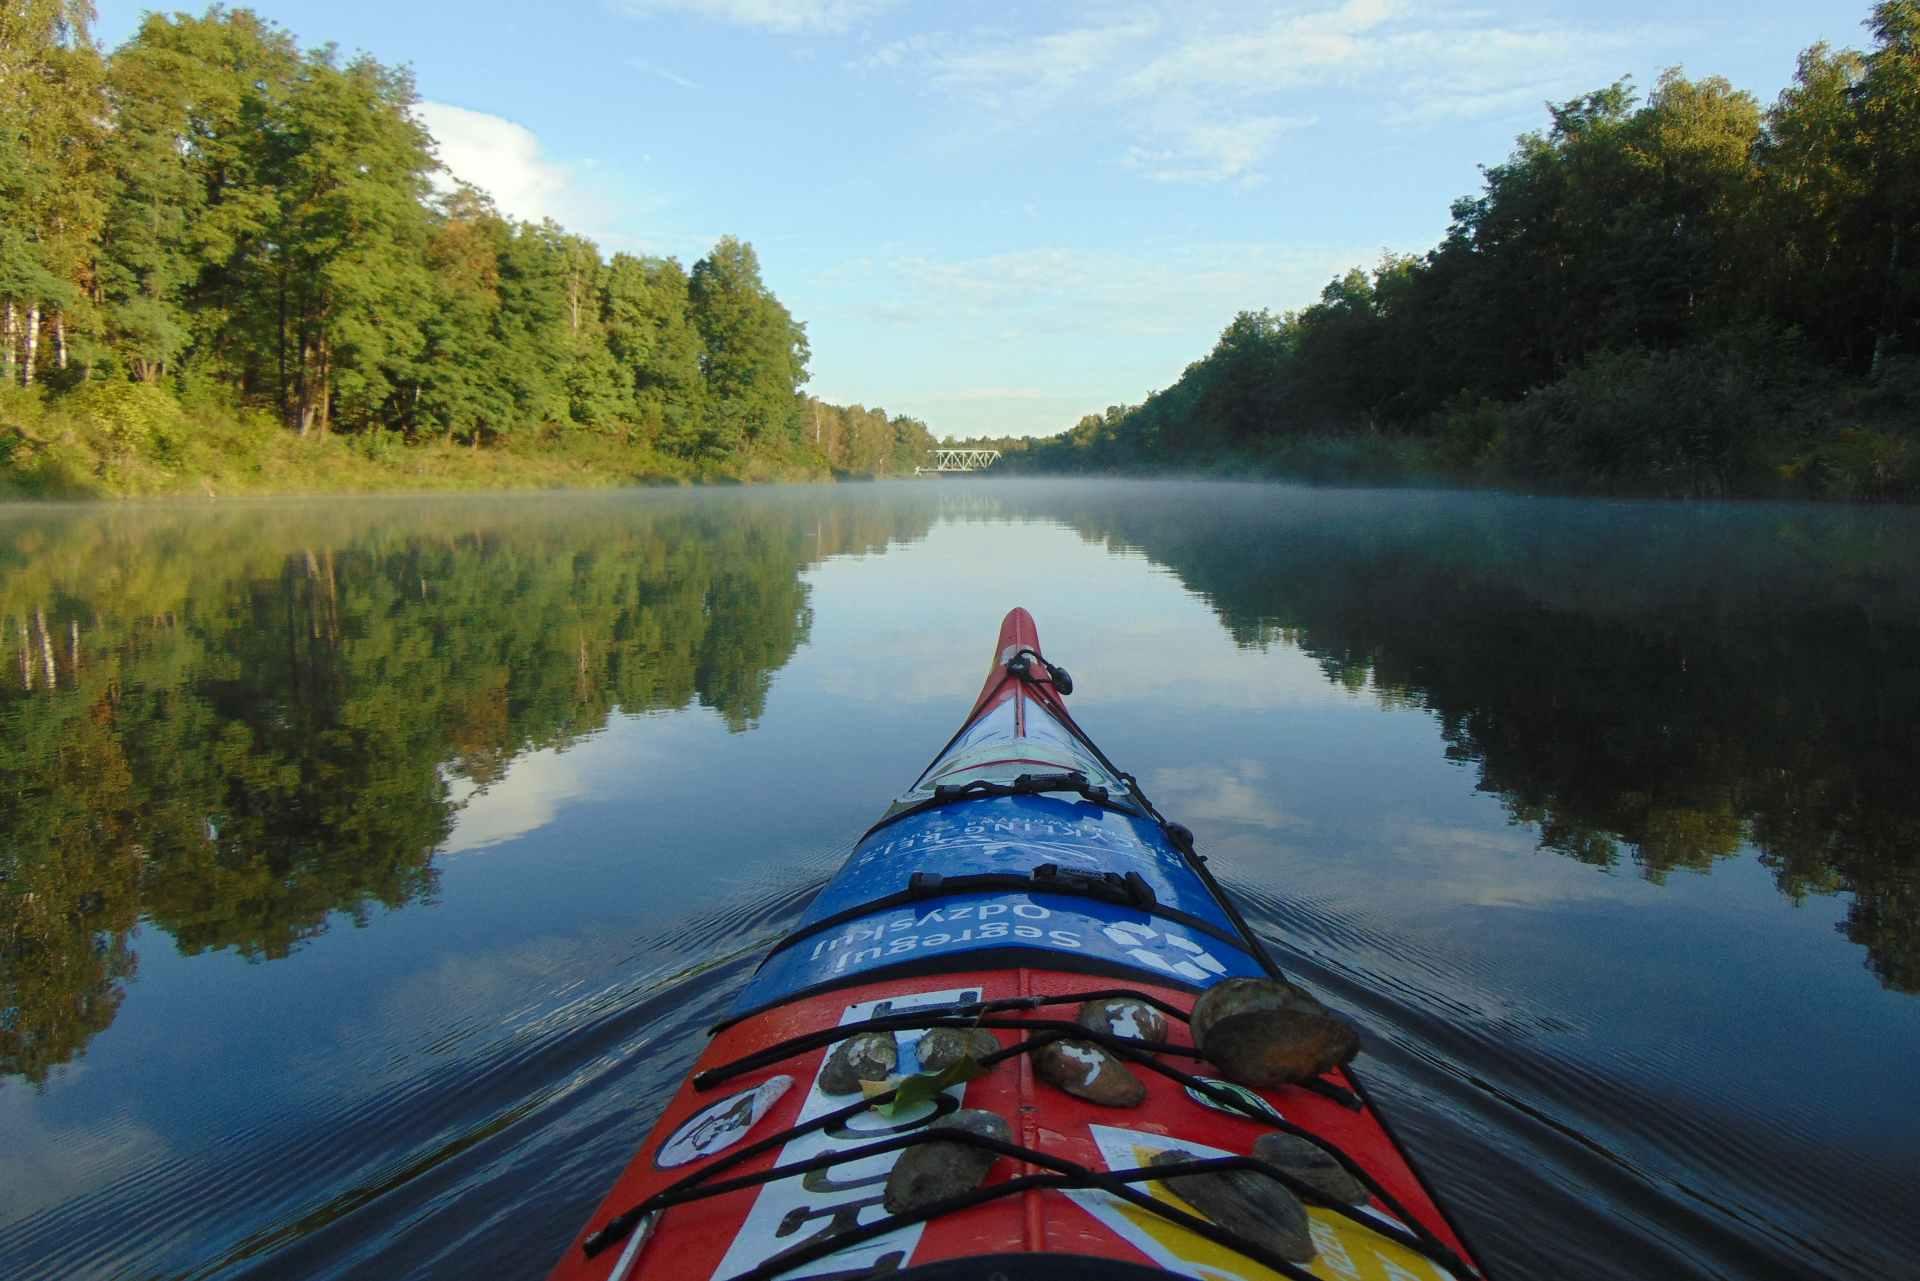 Kajak-Odertour von Umweltschützer Dominik Dobrowolski